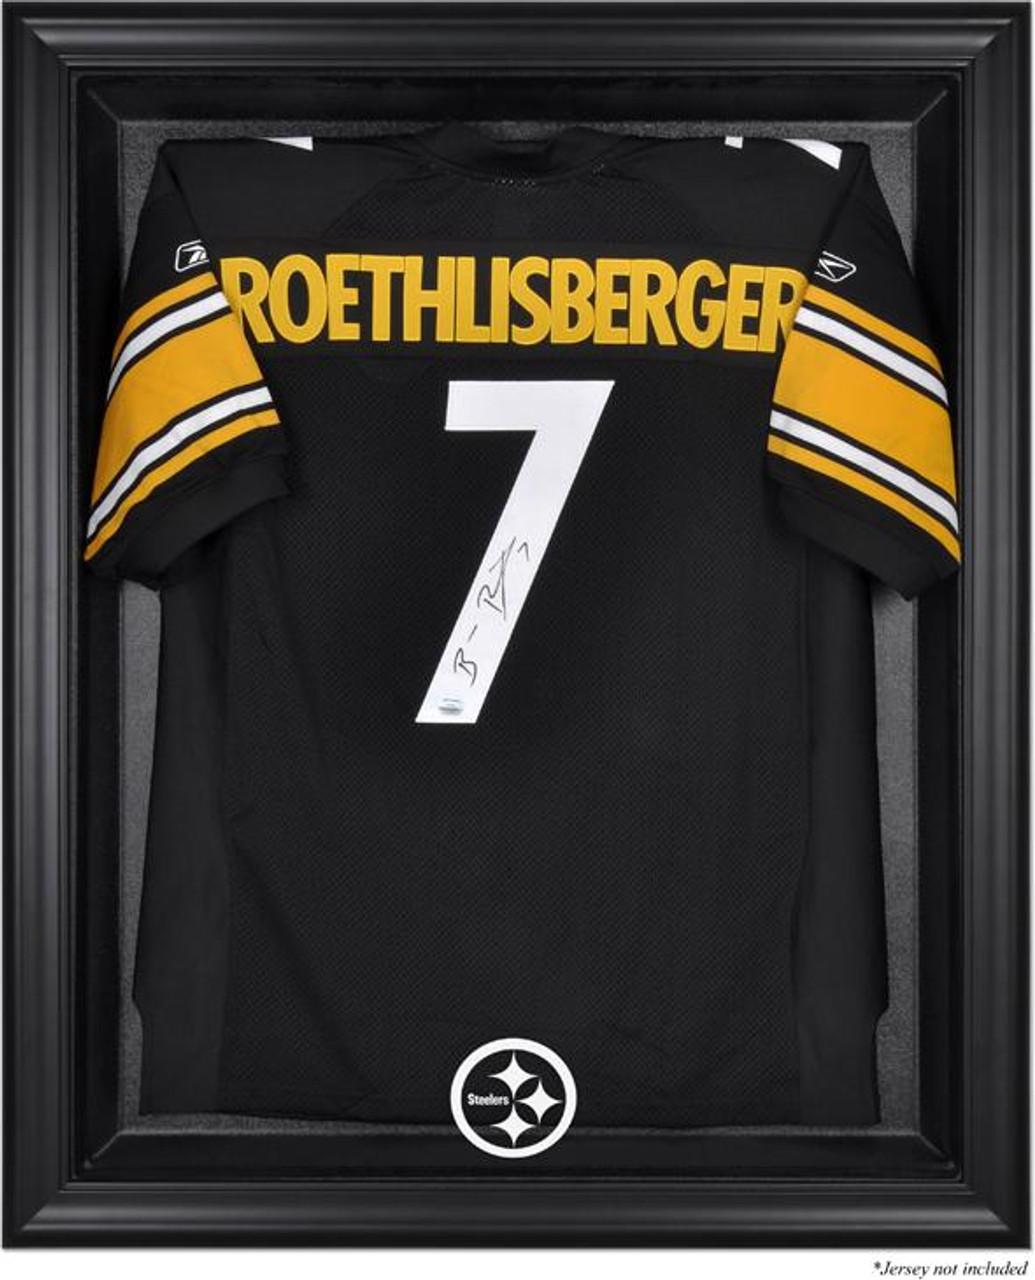 sale retailer 98ea7 e6b90 Black Framed Steelers Jersey Display Case